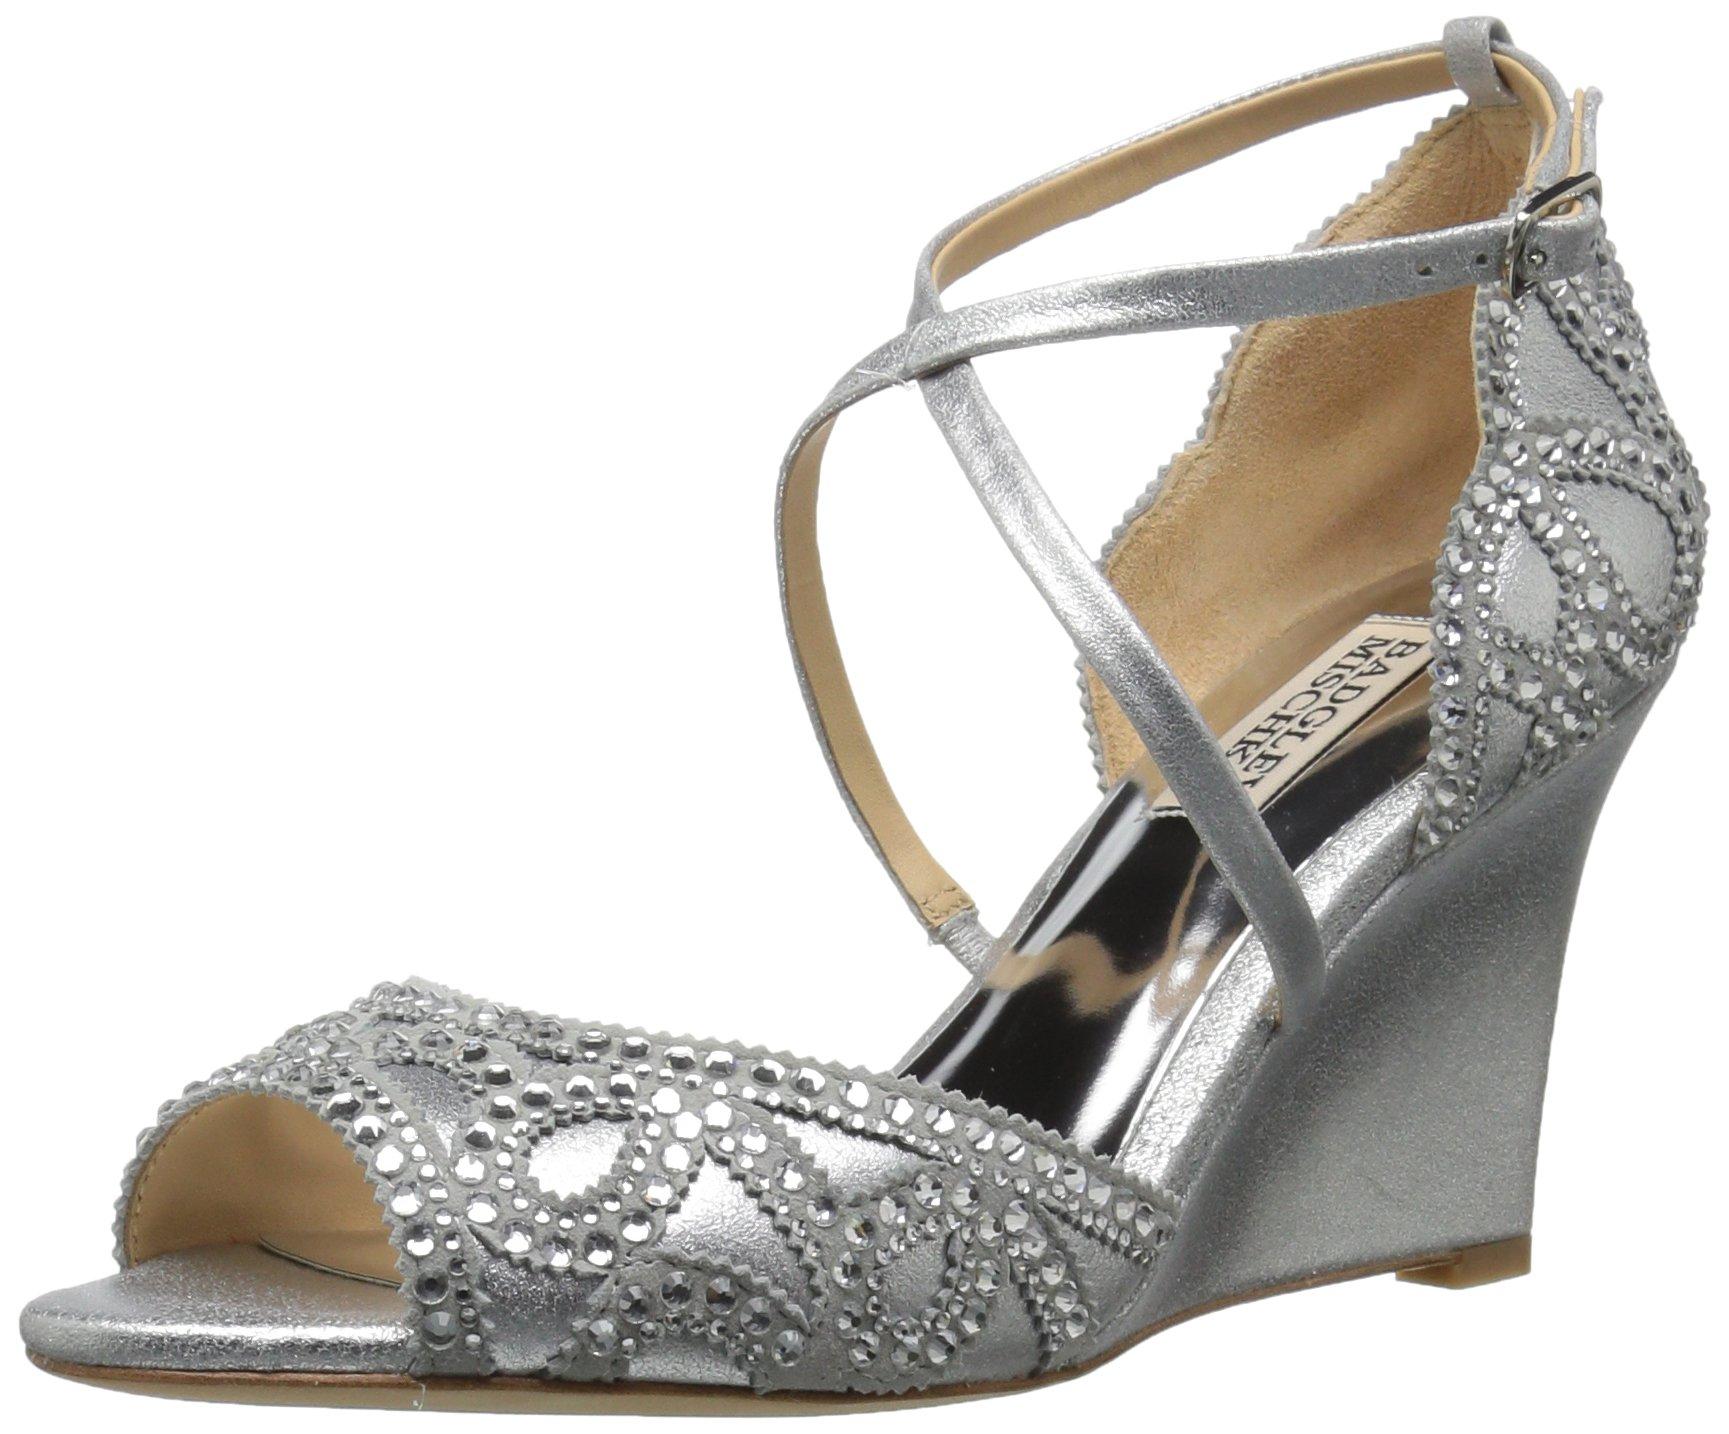 Badgley Mischka Women's Winter Wedge Sandal, Silver, 6 M US